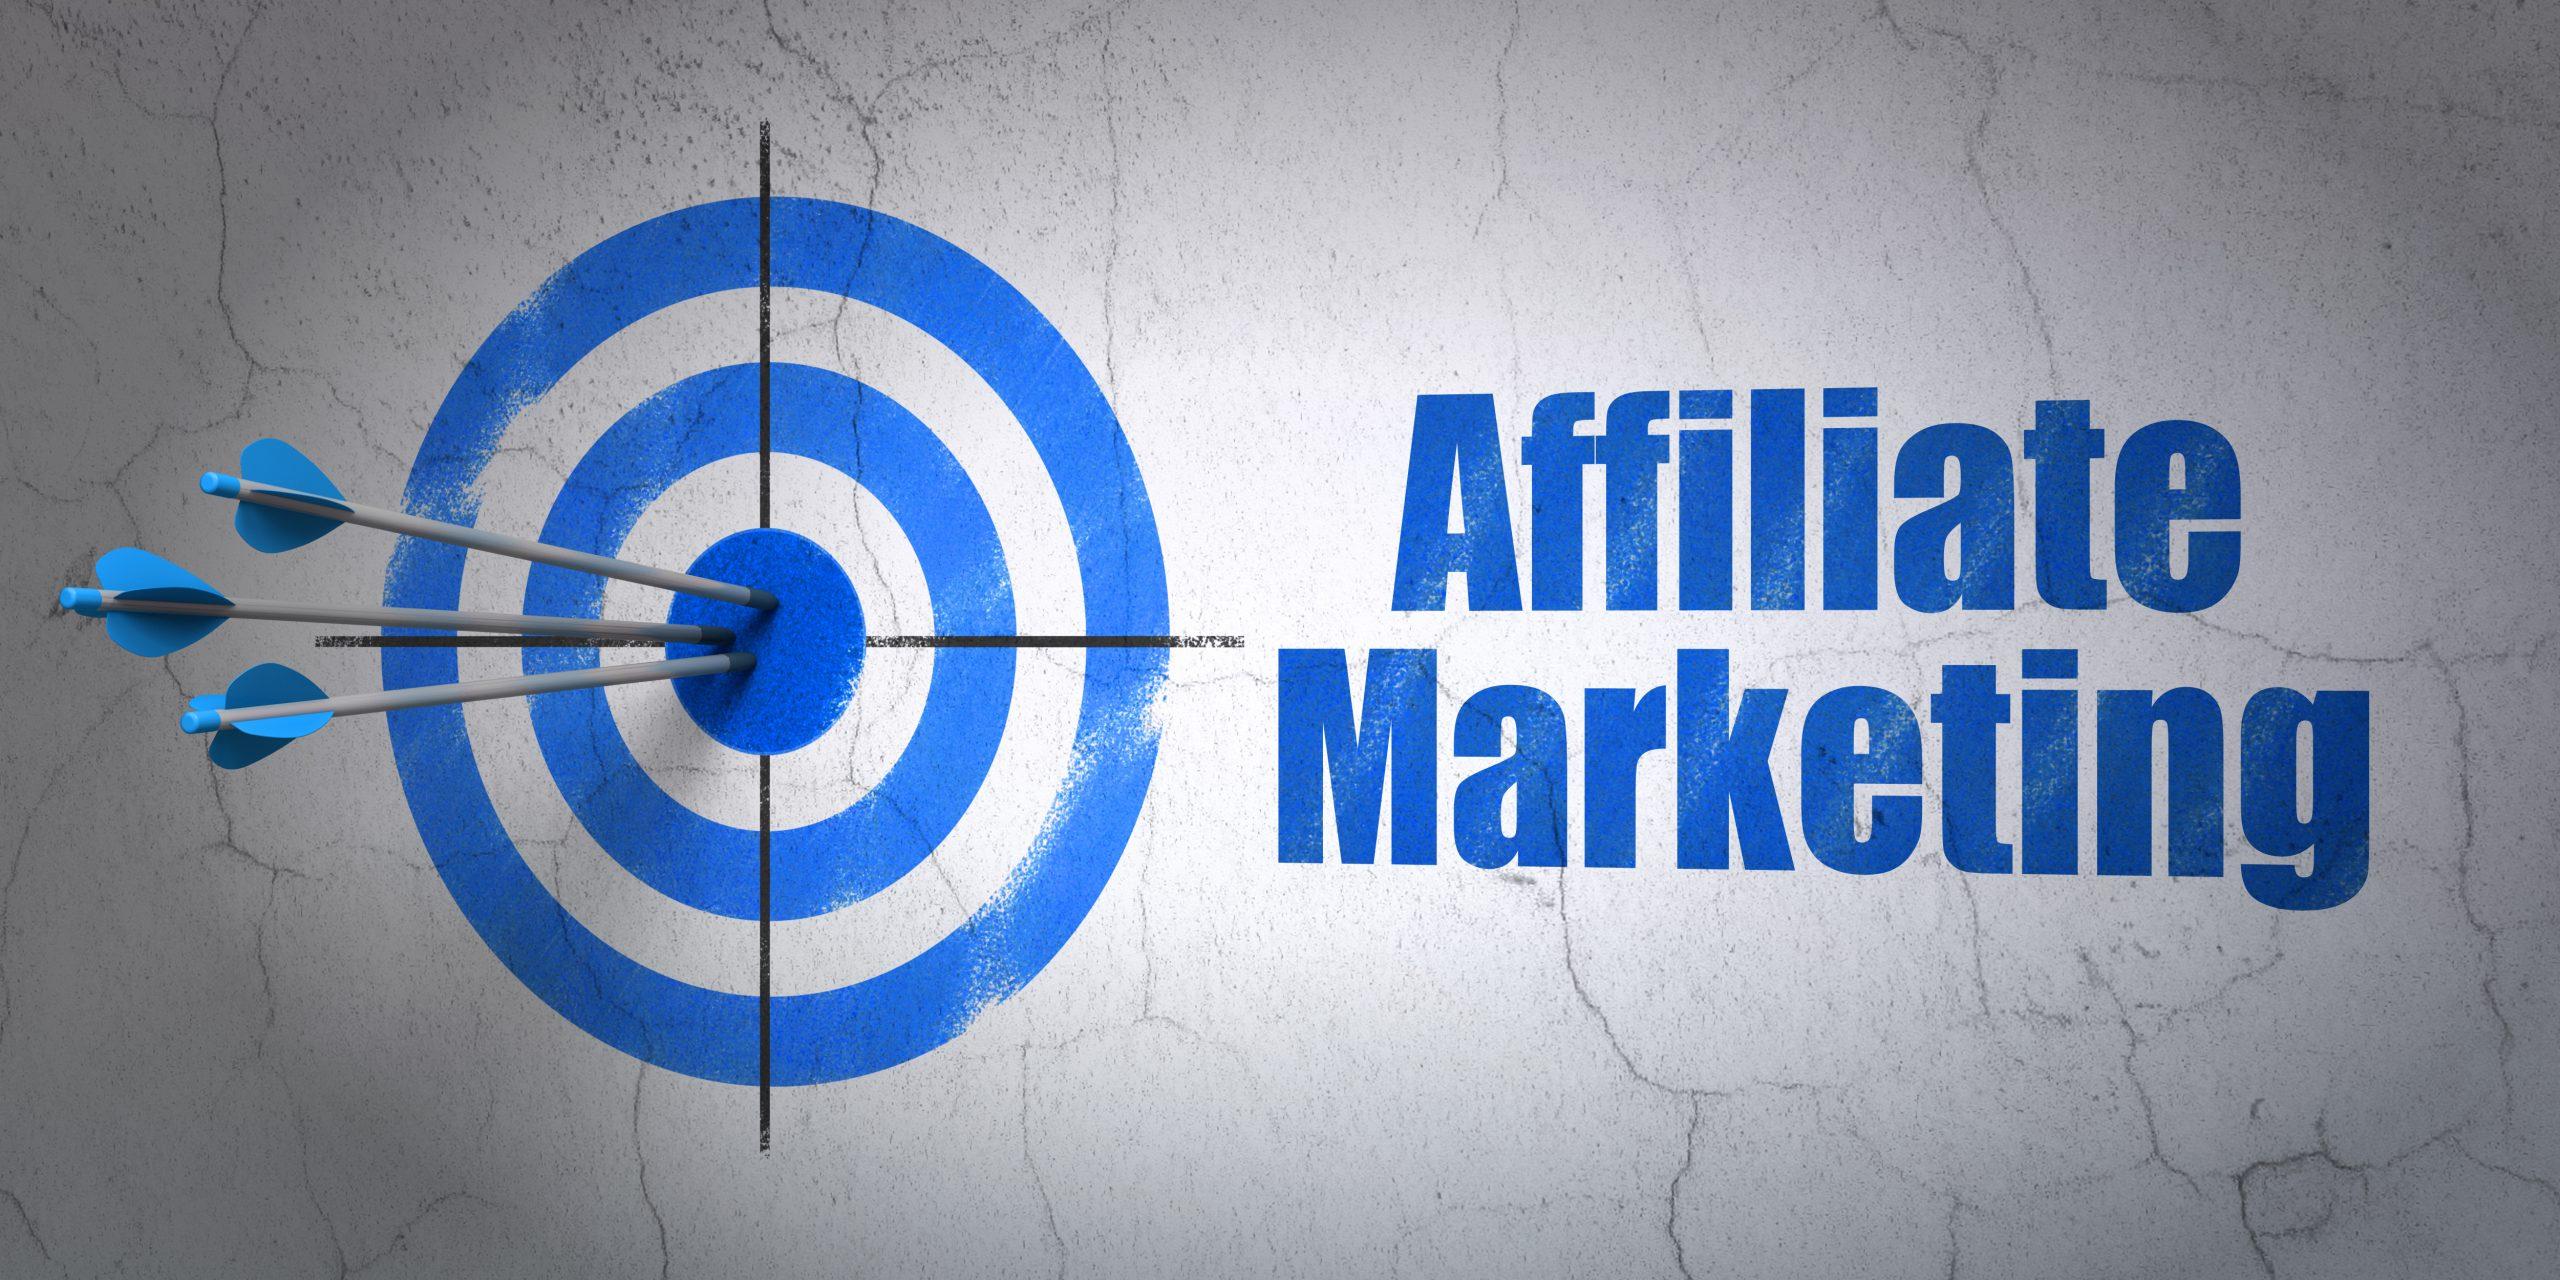 Make money online using Affiliate Marketing. check it out at jenbaucom.com. #affiliatemarketing #makemoneyonline #makemoney